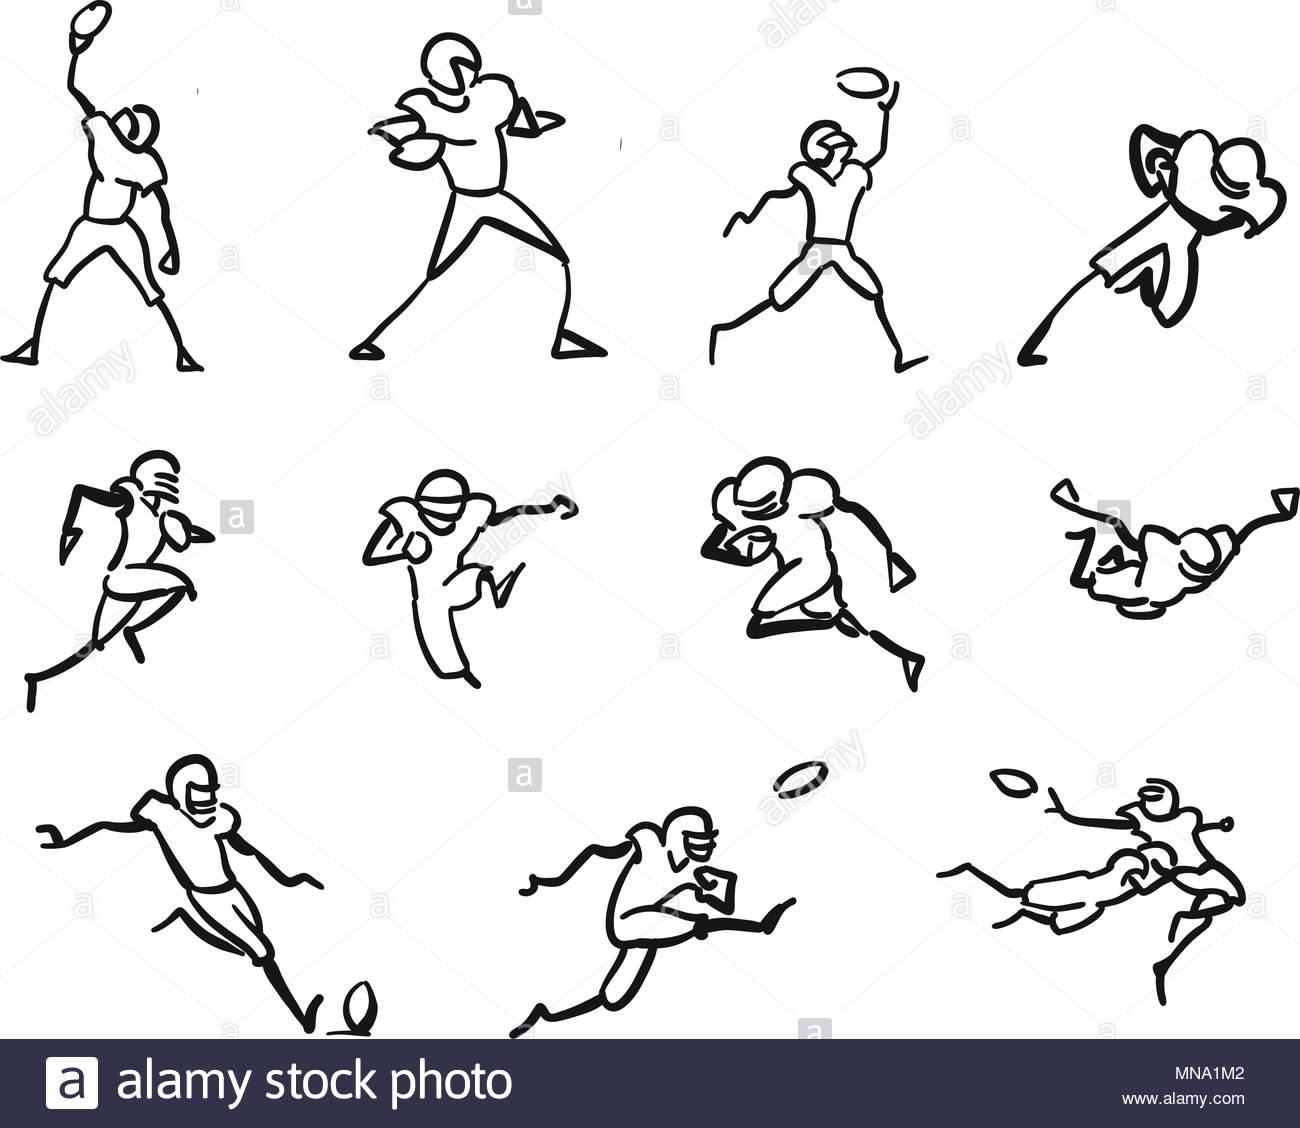 1300x1128 American Football Player Motion Sketch Studies, Hand Drawn Vector